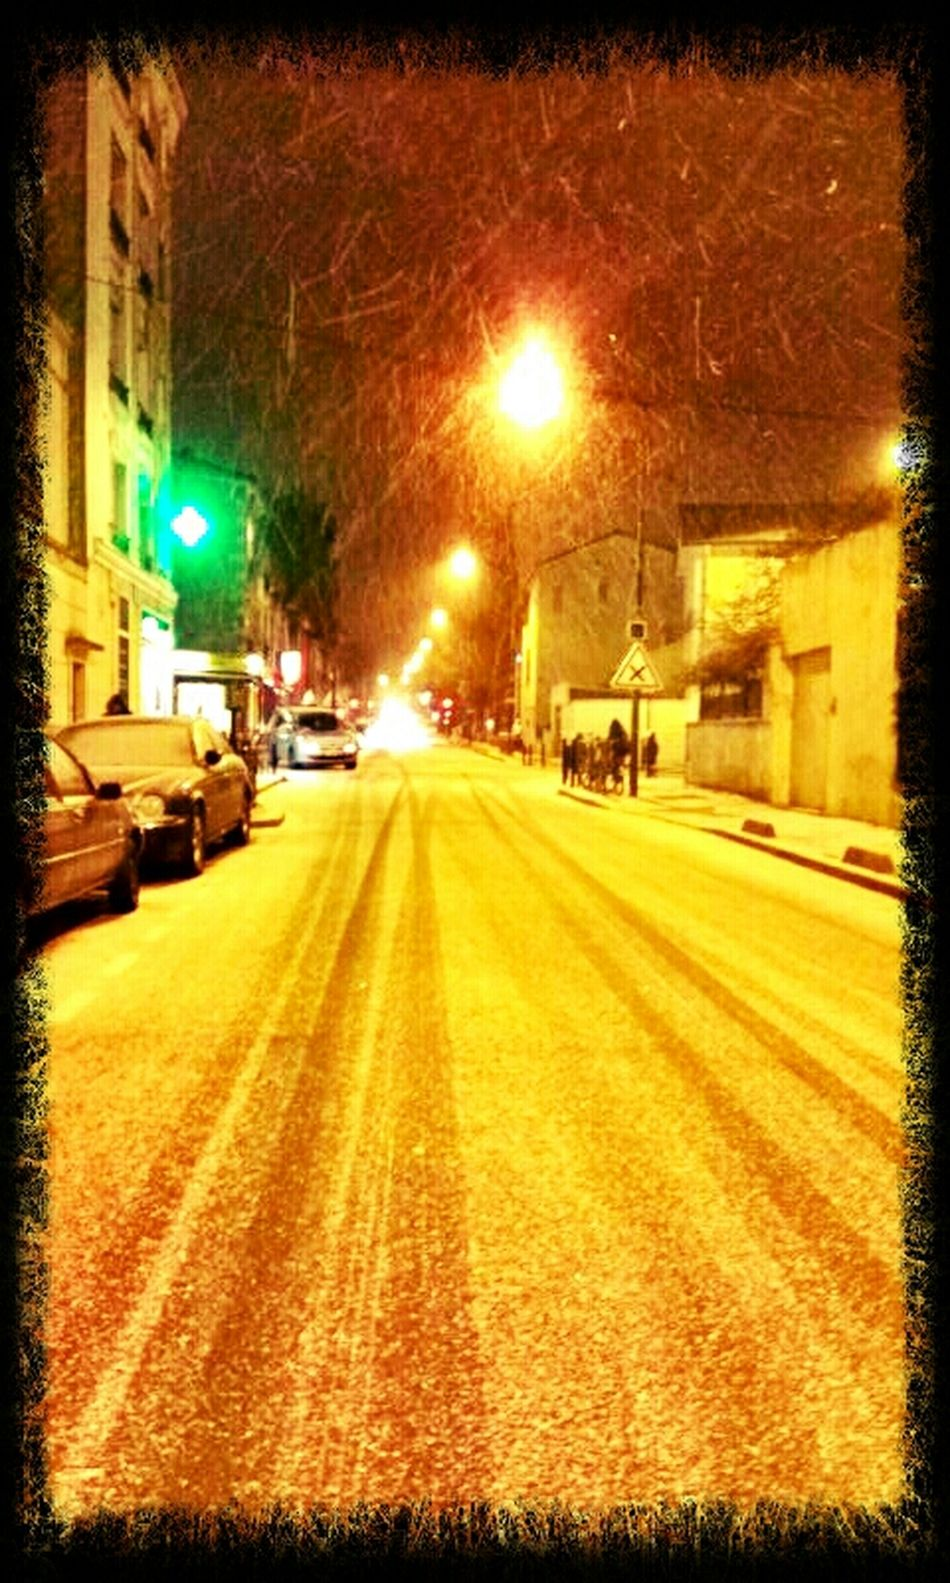 Streetphotography Urban Snow Je N'aime Pas Le Froid